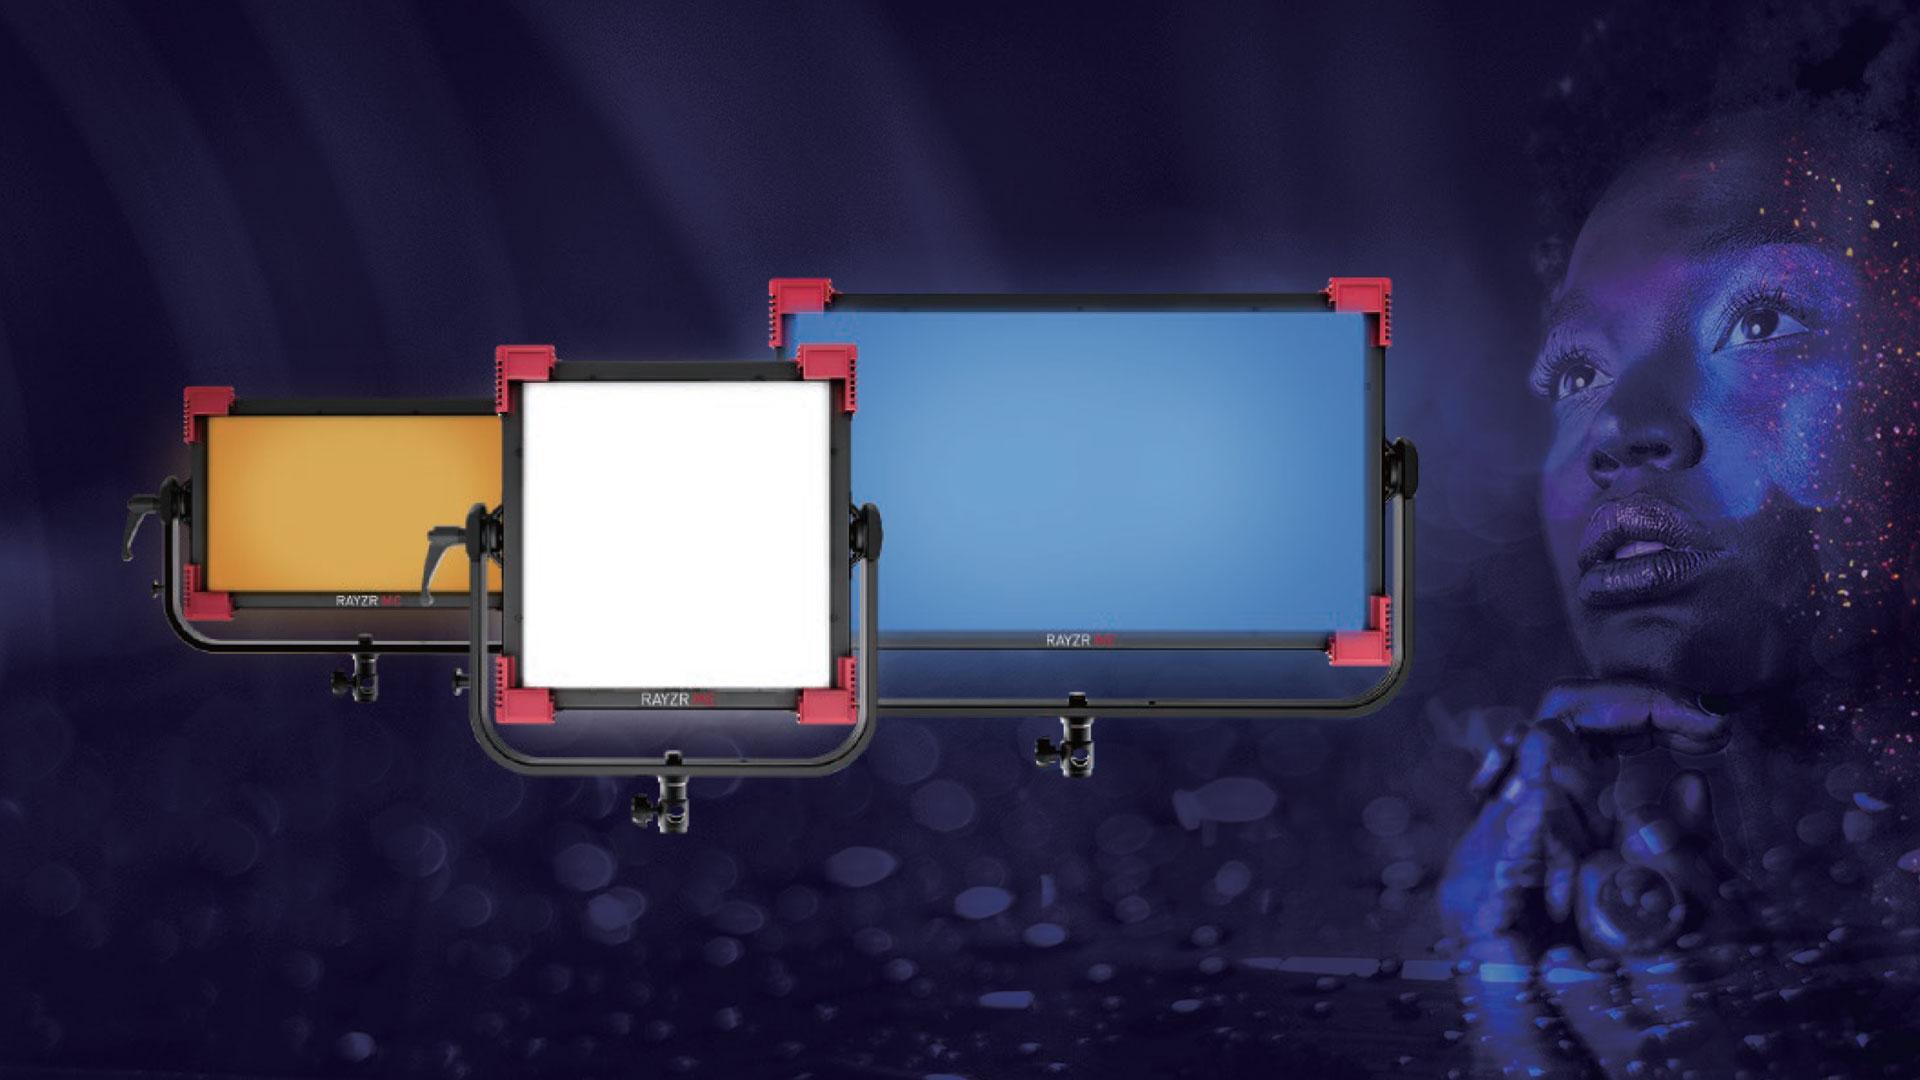 Presentaron los Rayzr MC - Paneles LED RGBWW de alta calidad